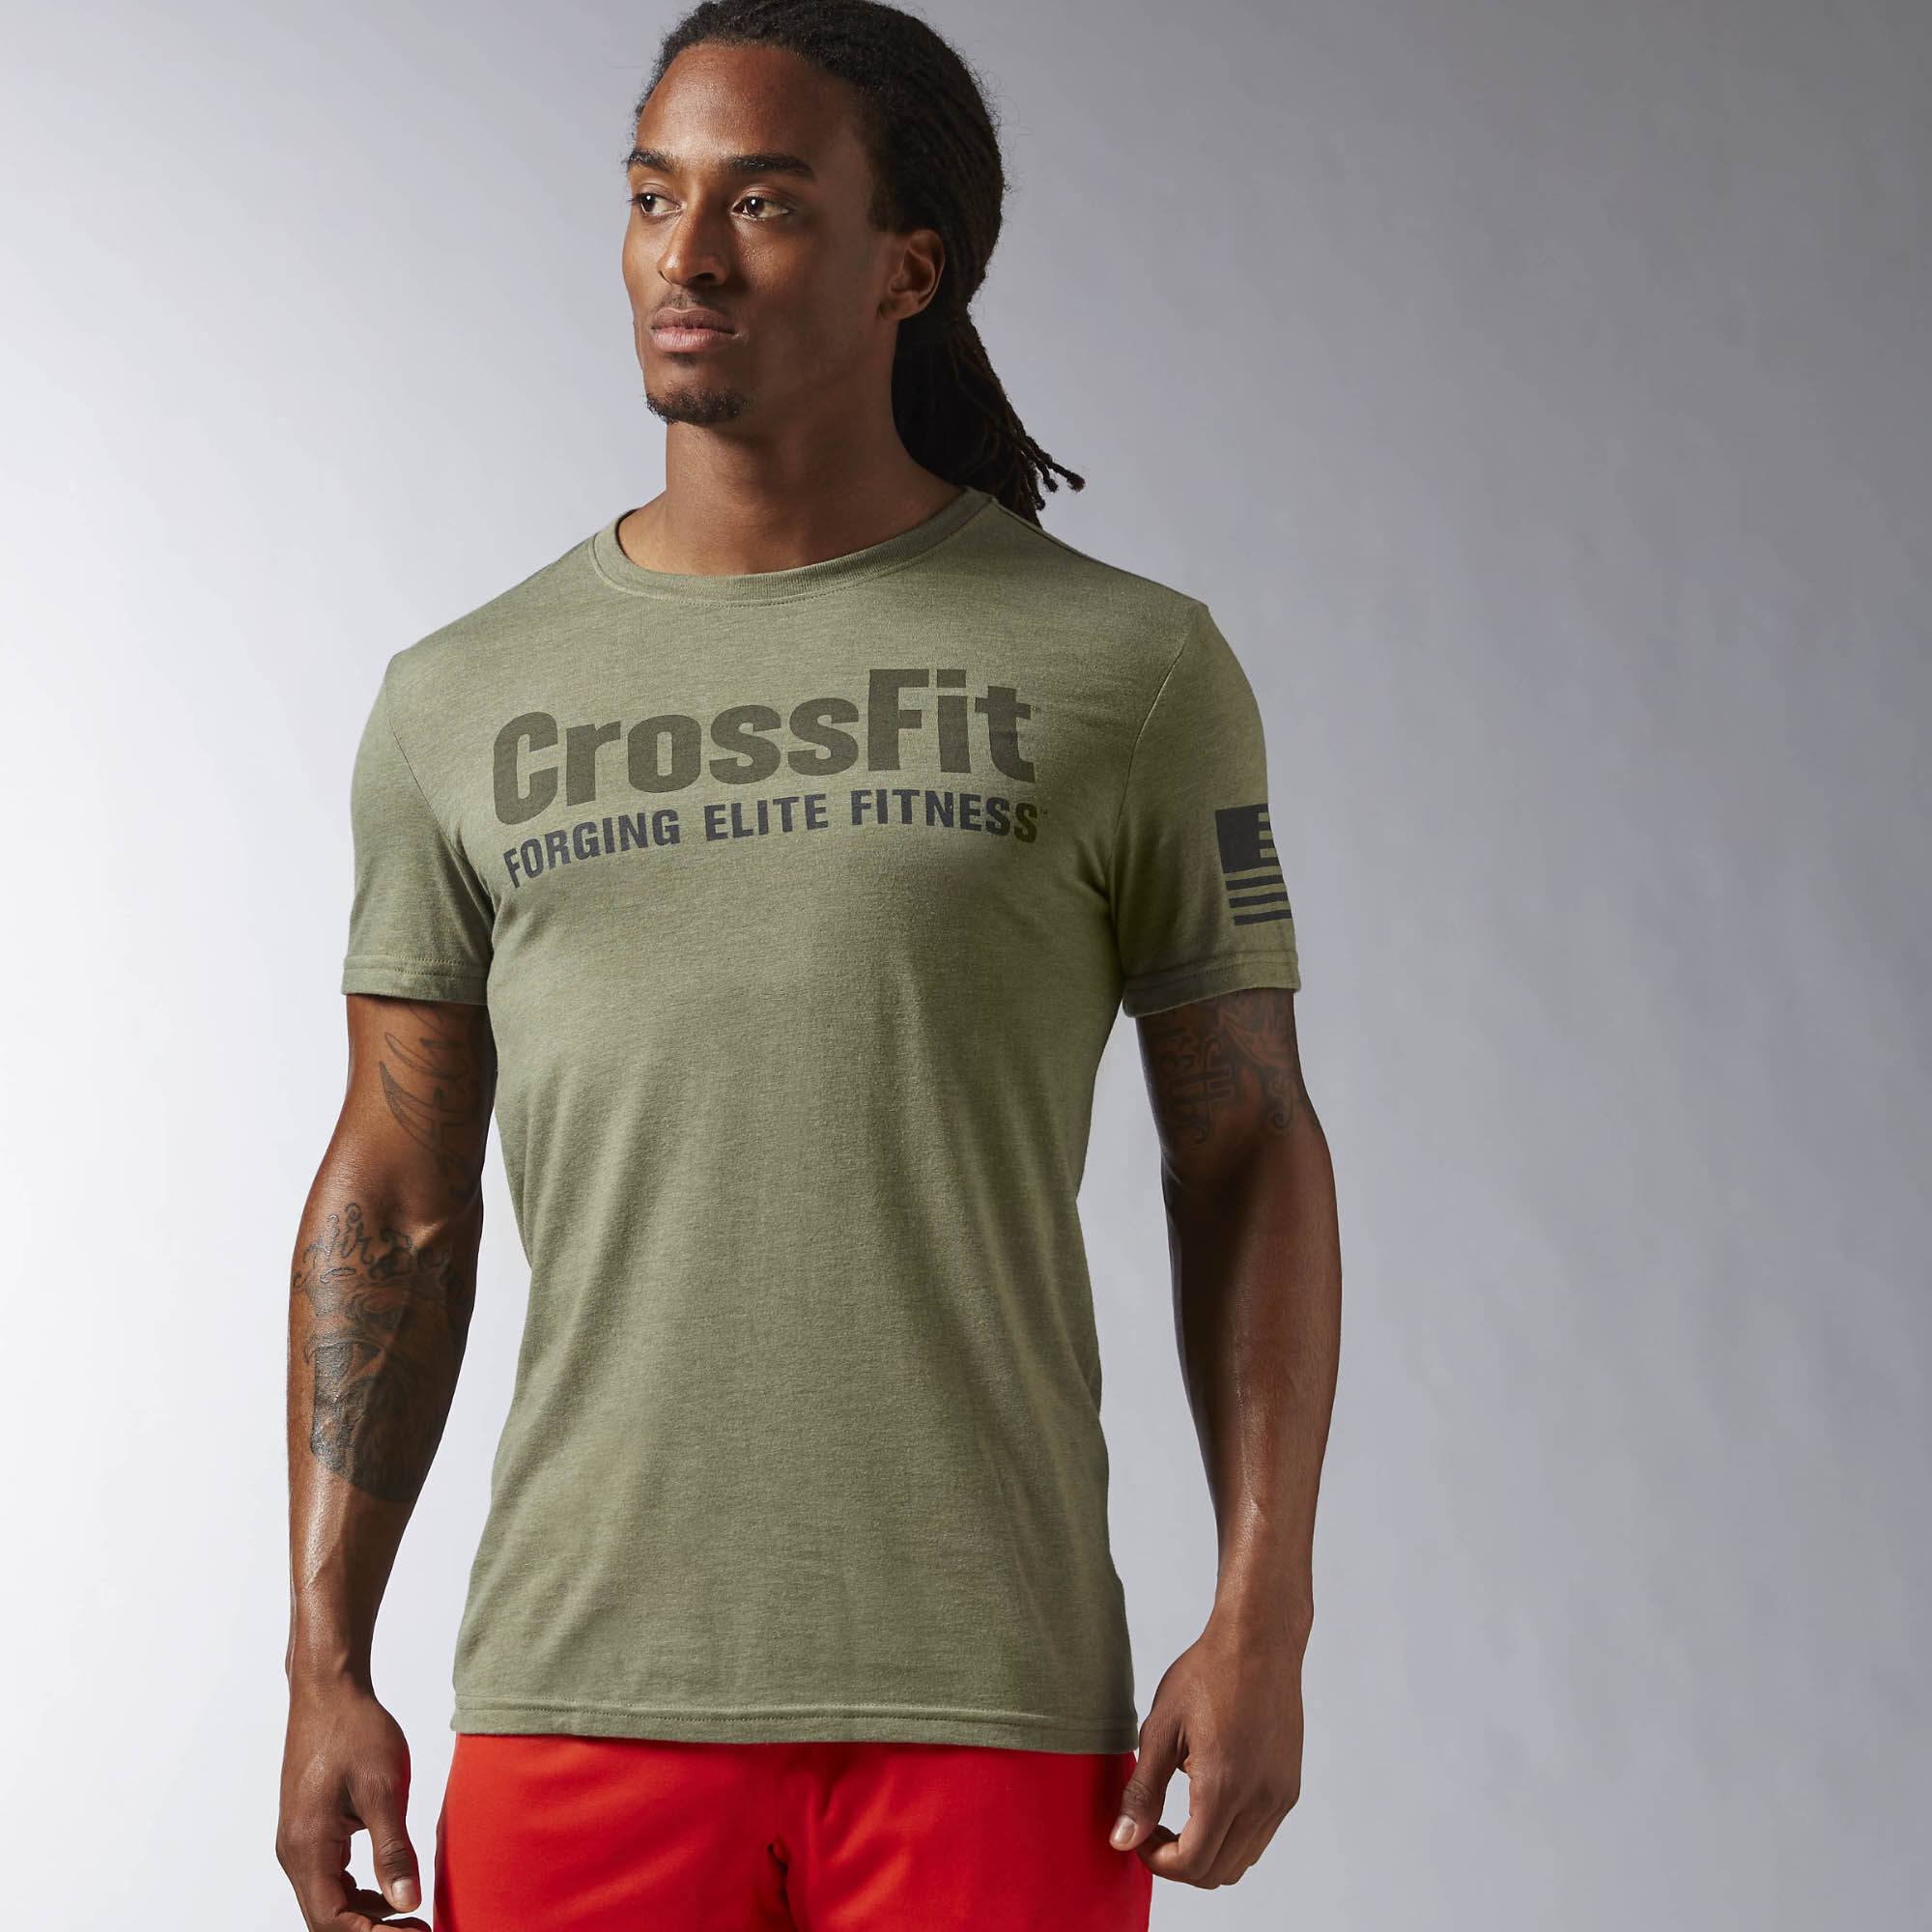 reebok crossfit forging elite fitness tee. Black Bedroom Furniture Sets. Home Design Ideas